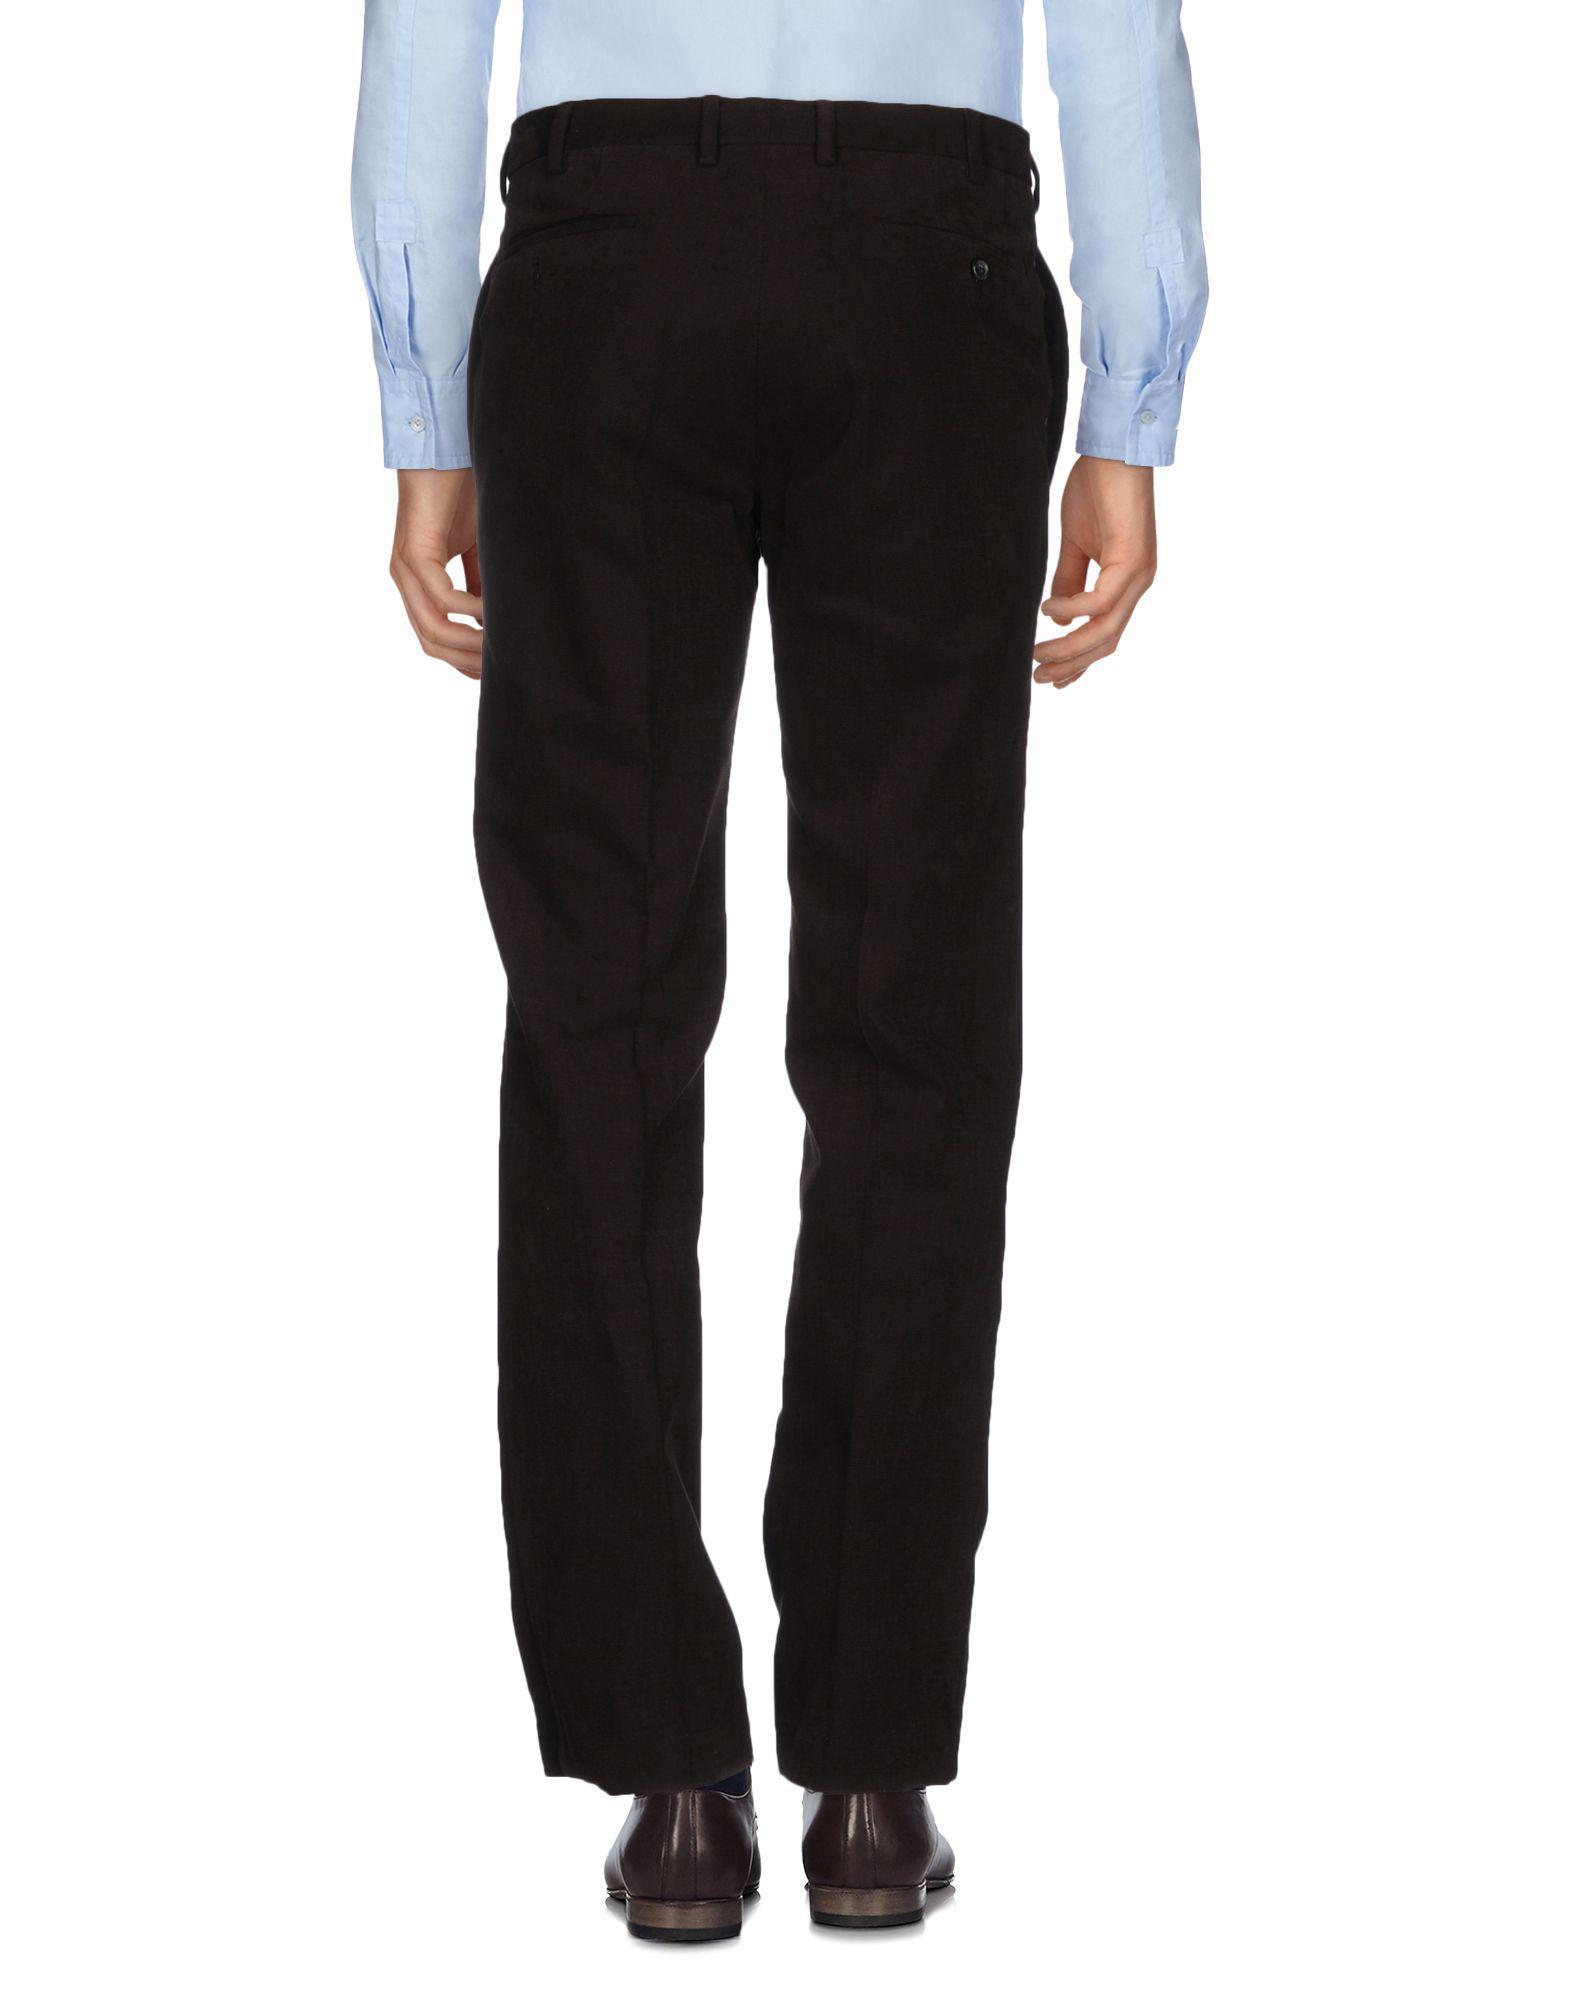 Burberry Cotton Casual Pants in Dark Brown (Brown) for Men